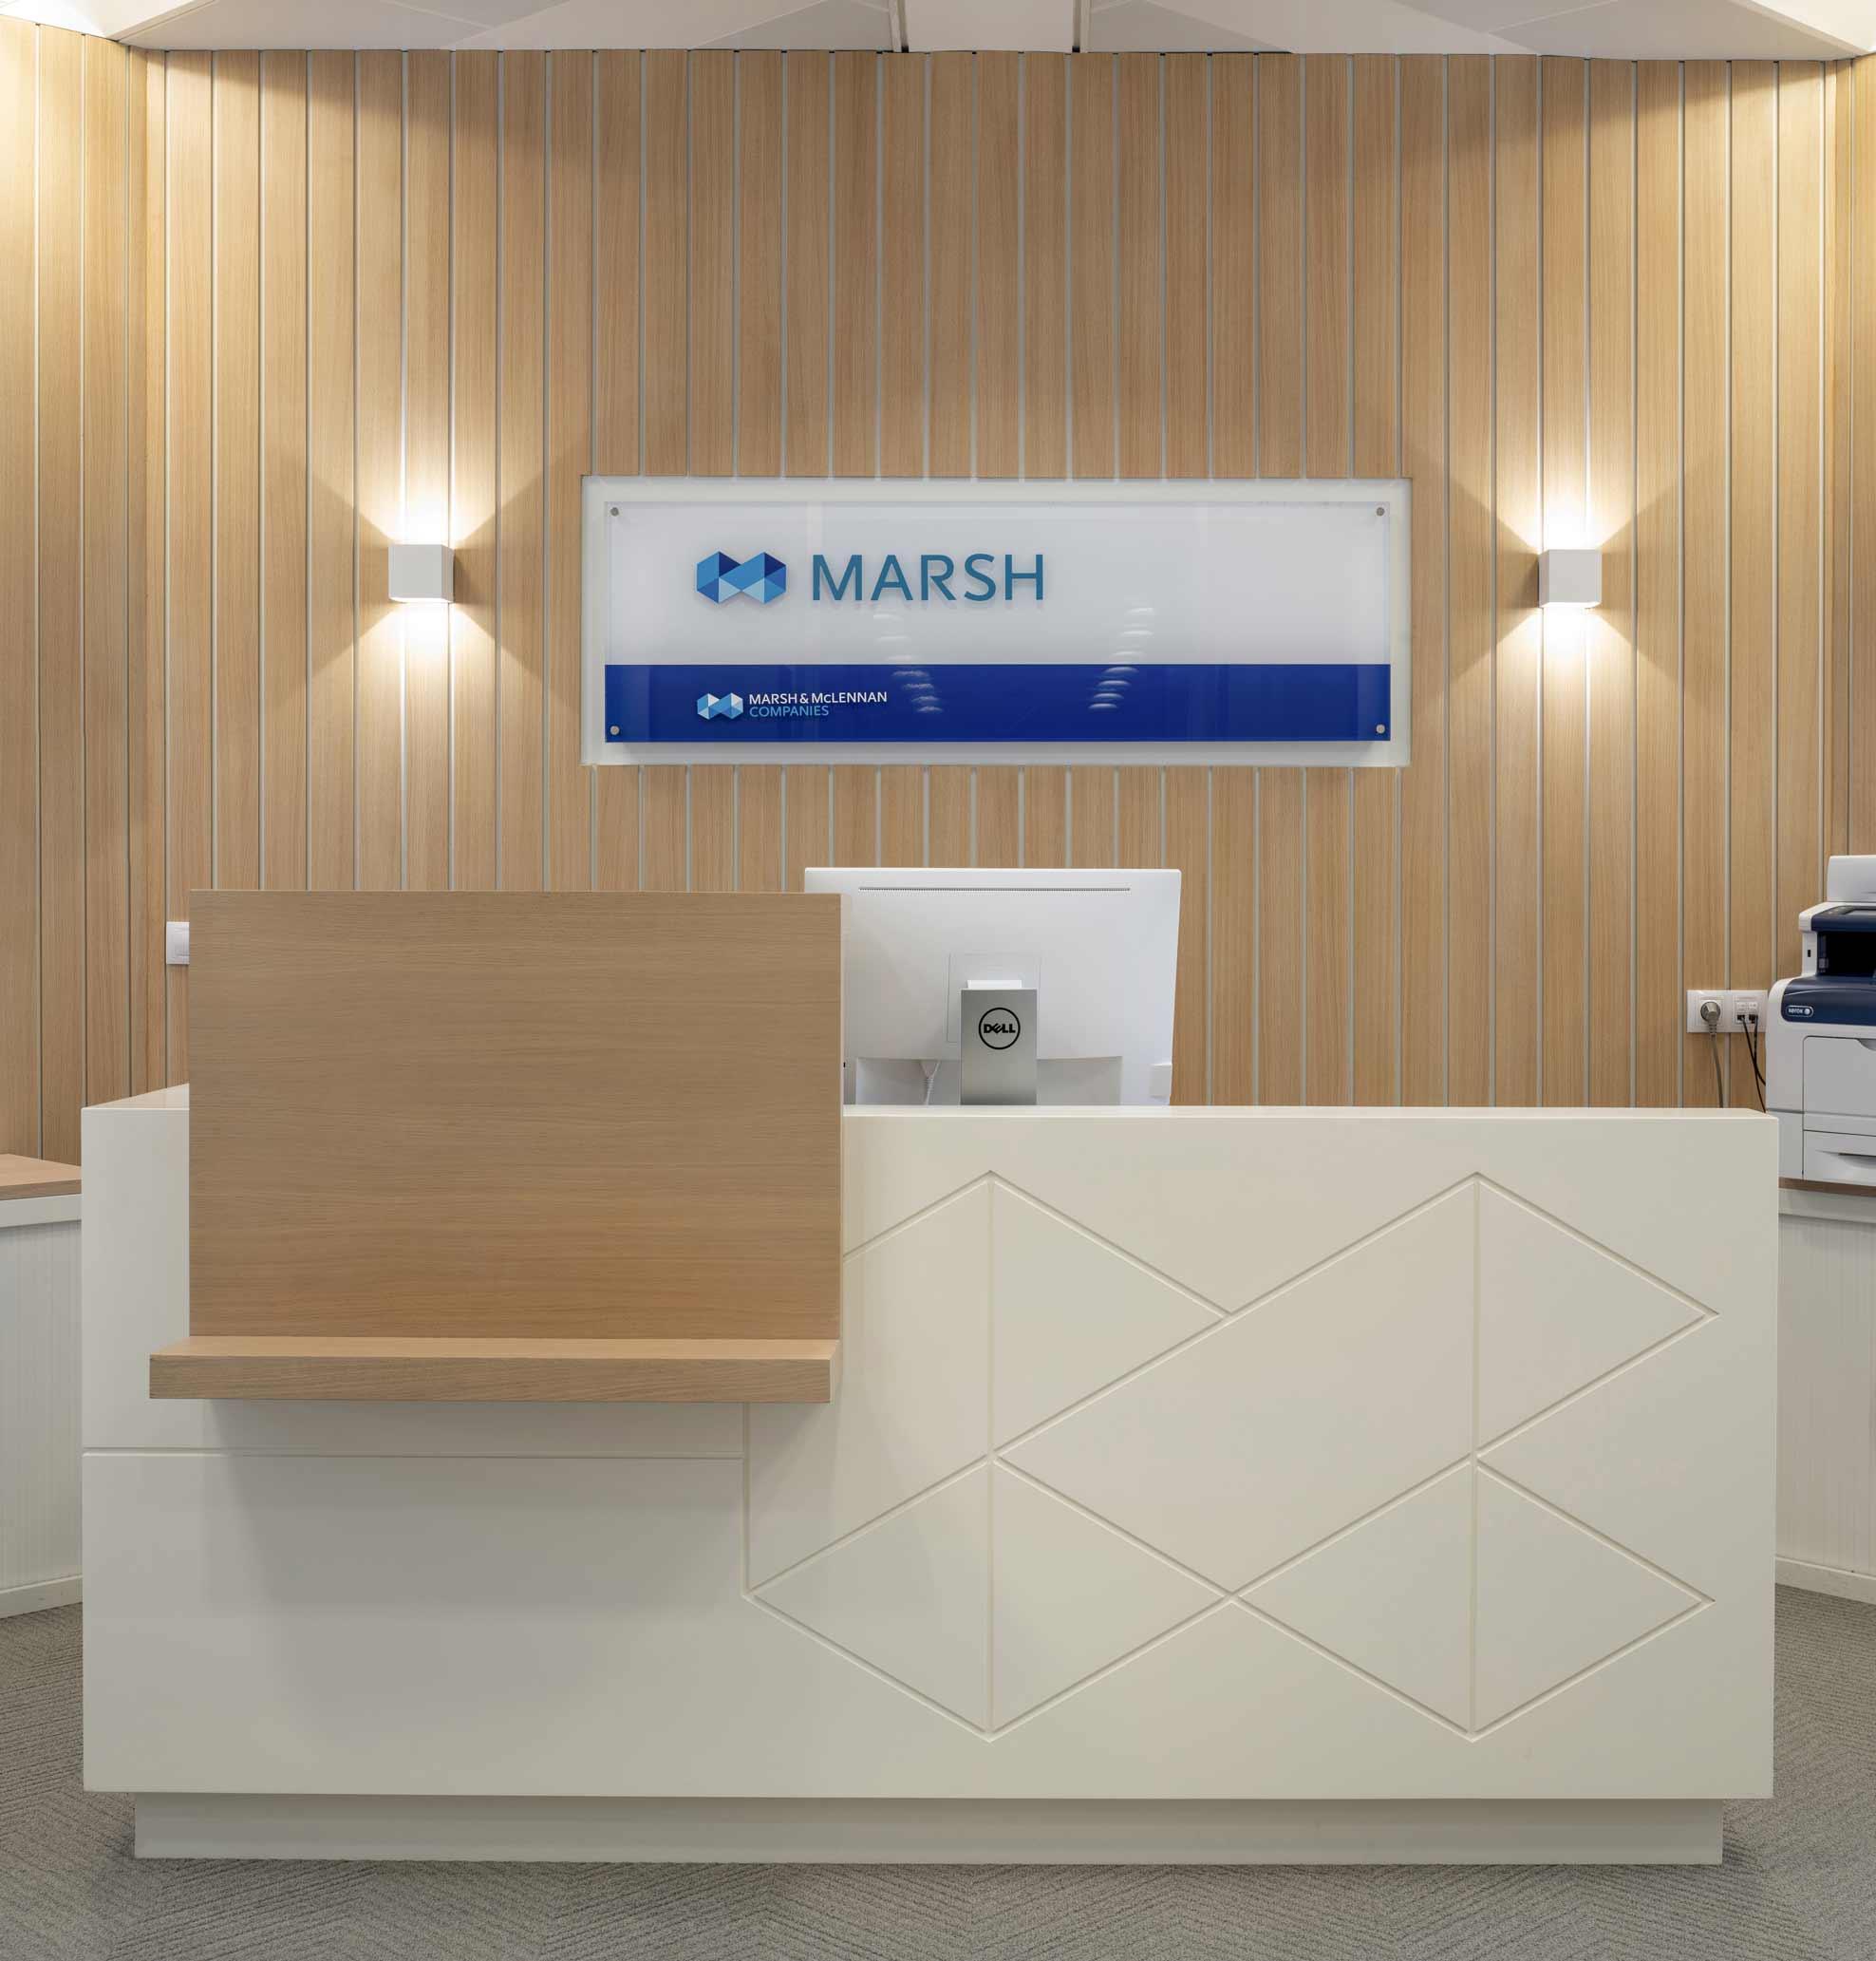 MARSH_04